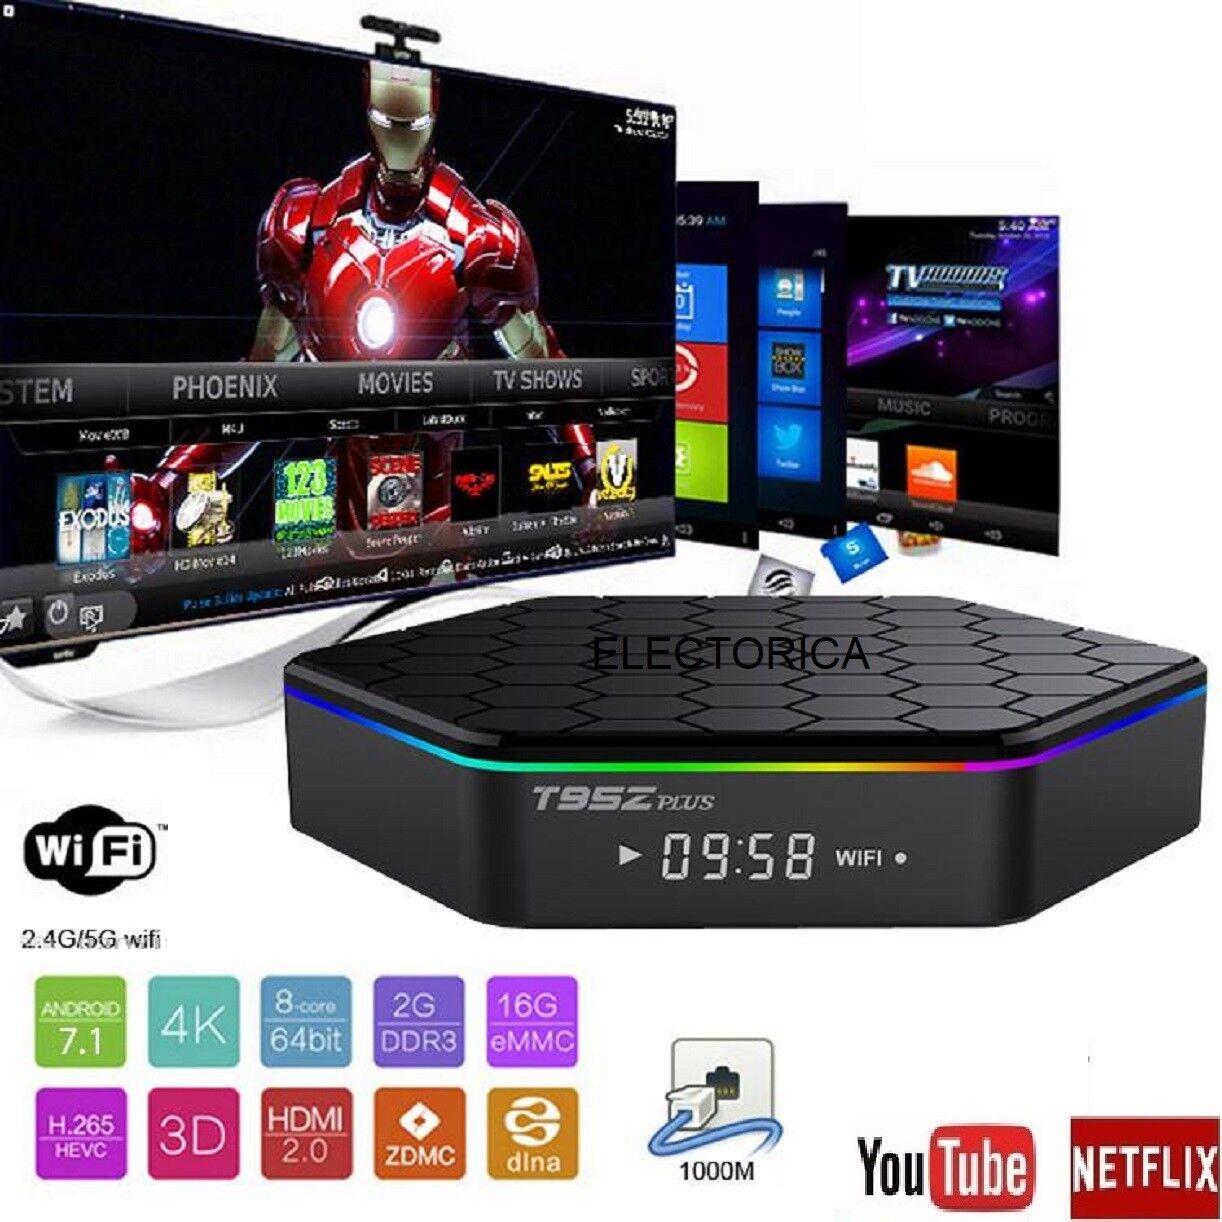 T95Z PLUS OCTO Core ANDROID TV BOX + KODI IPTV HD 4K SMART TV YOUTUBE NETFLIX